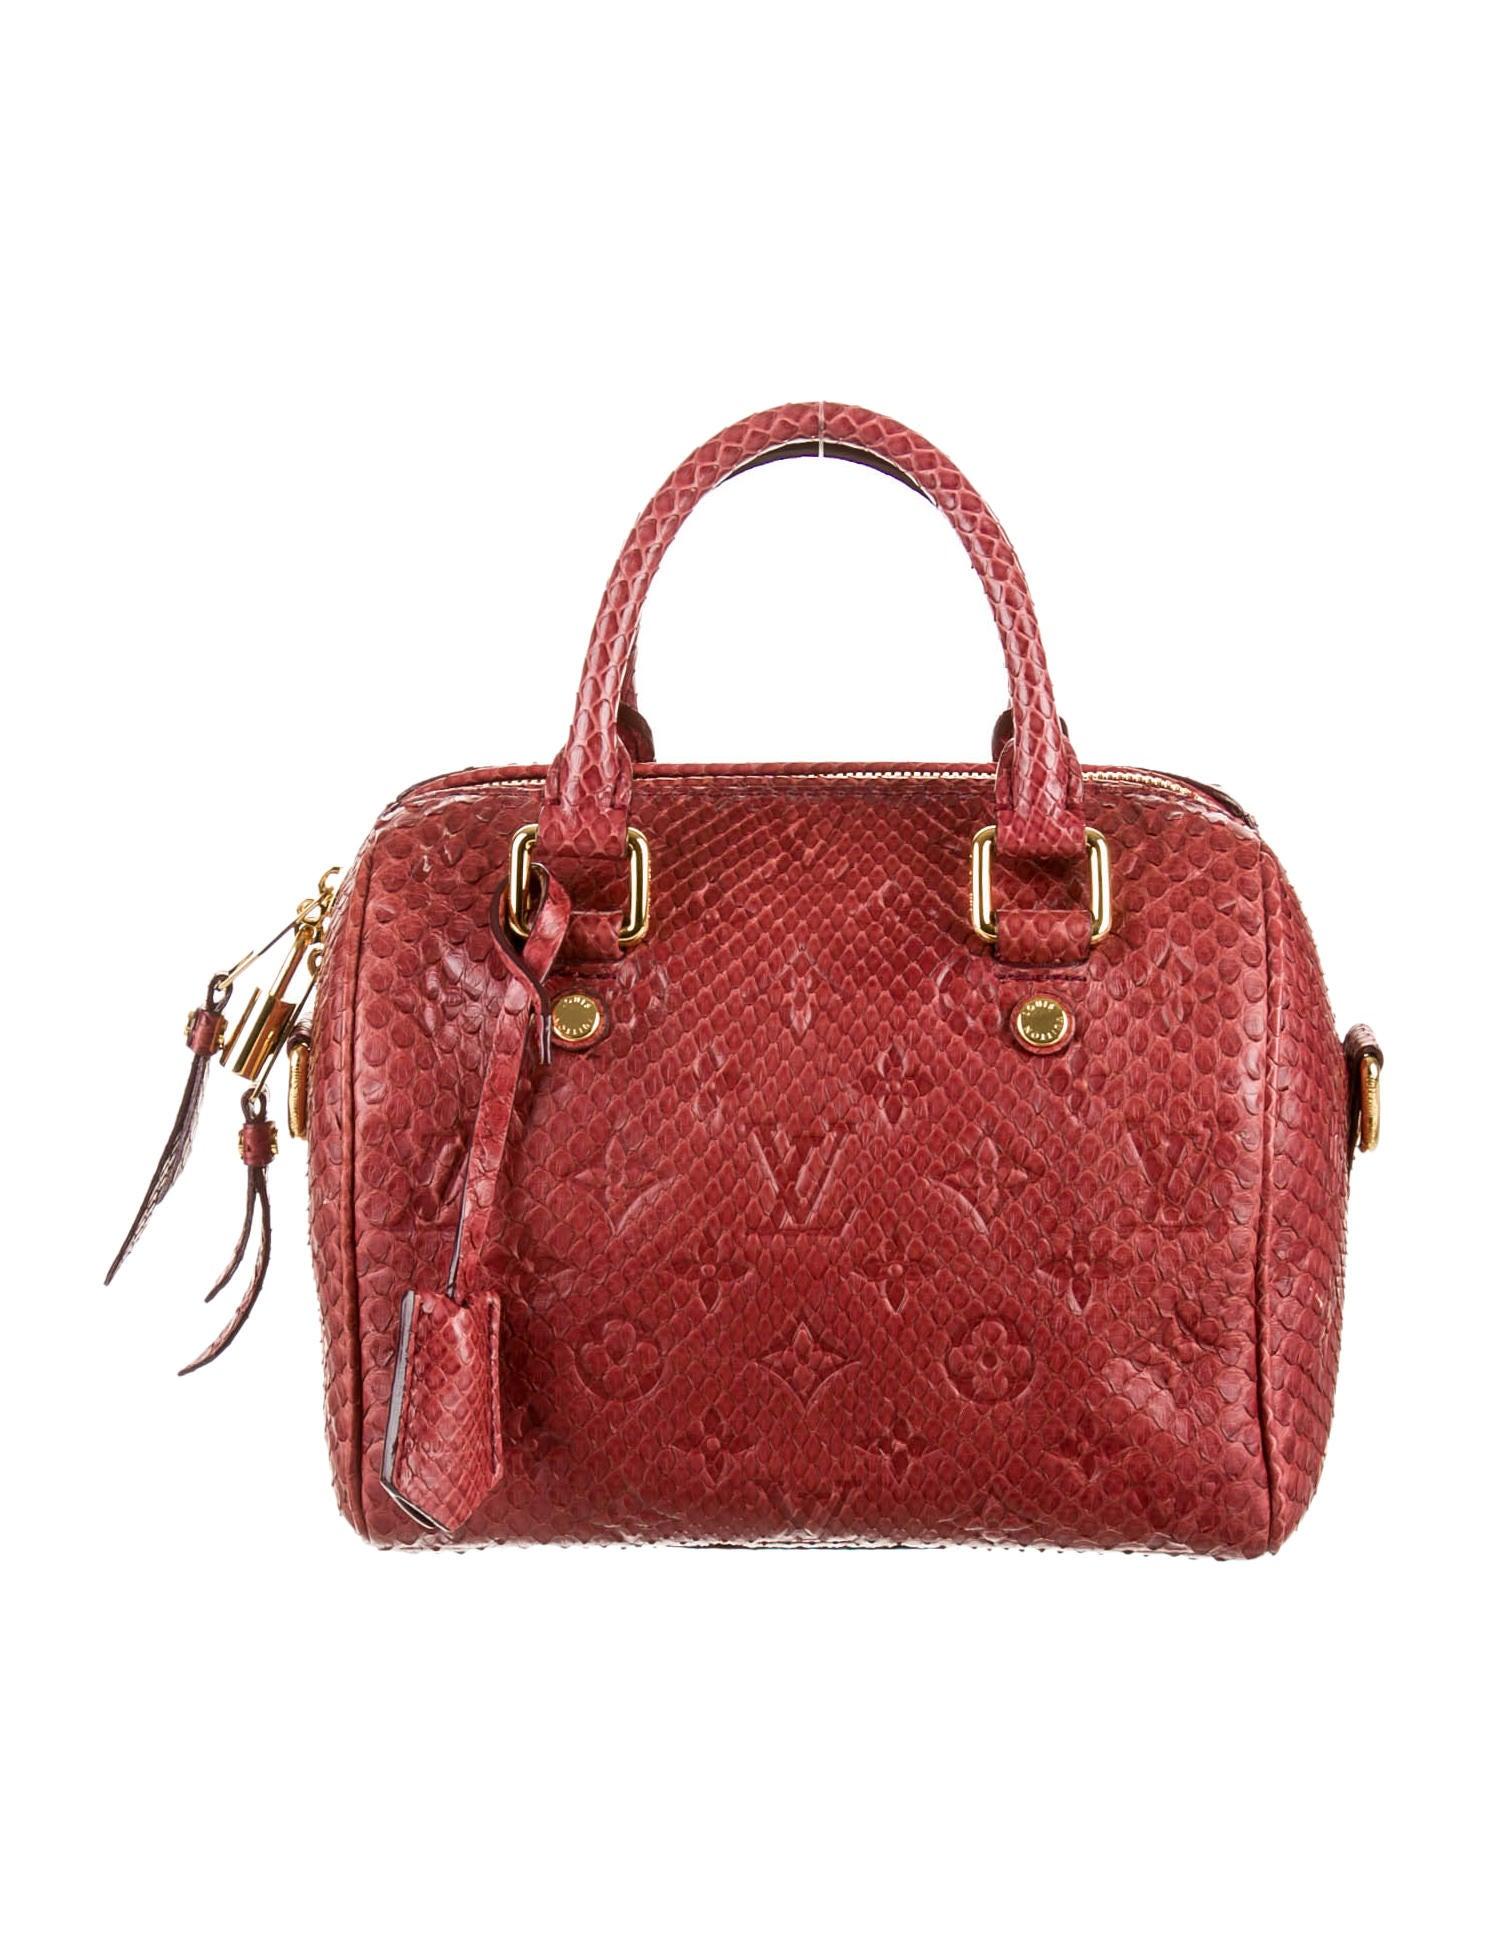 louis vuitton speedy bandouliere 20 handbags lou52520. Black Bedroom Furniture Sets. Home Design Ideas